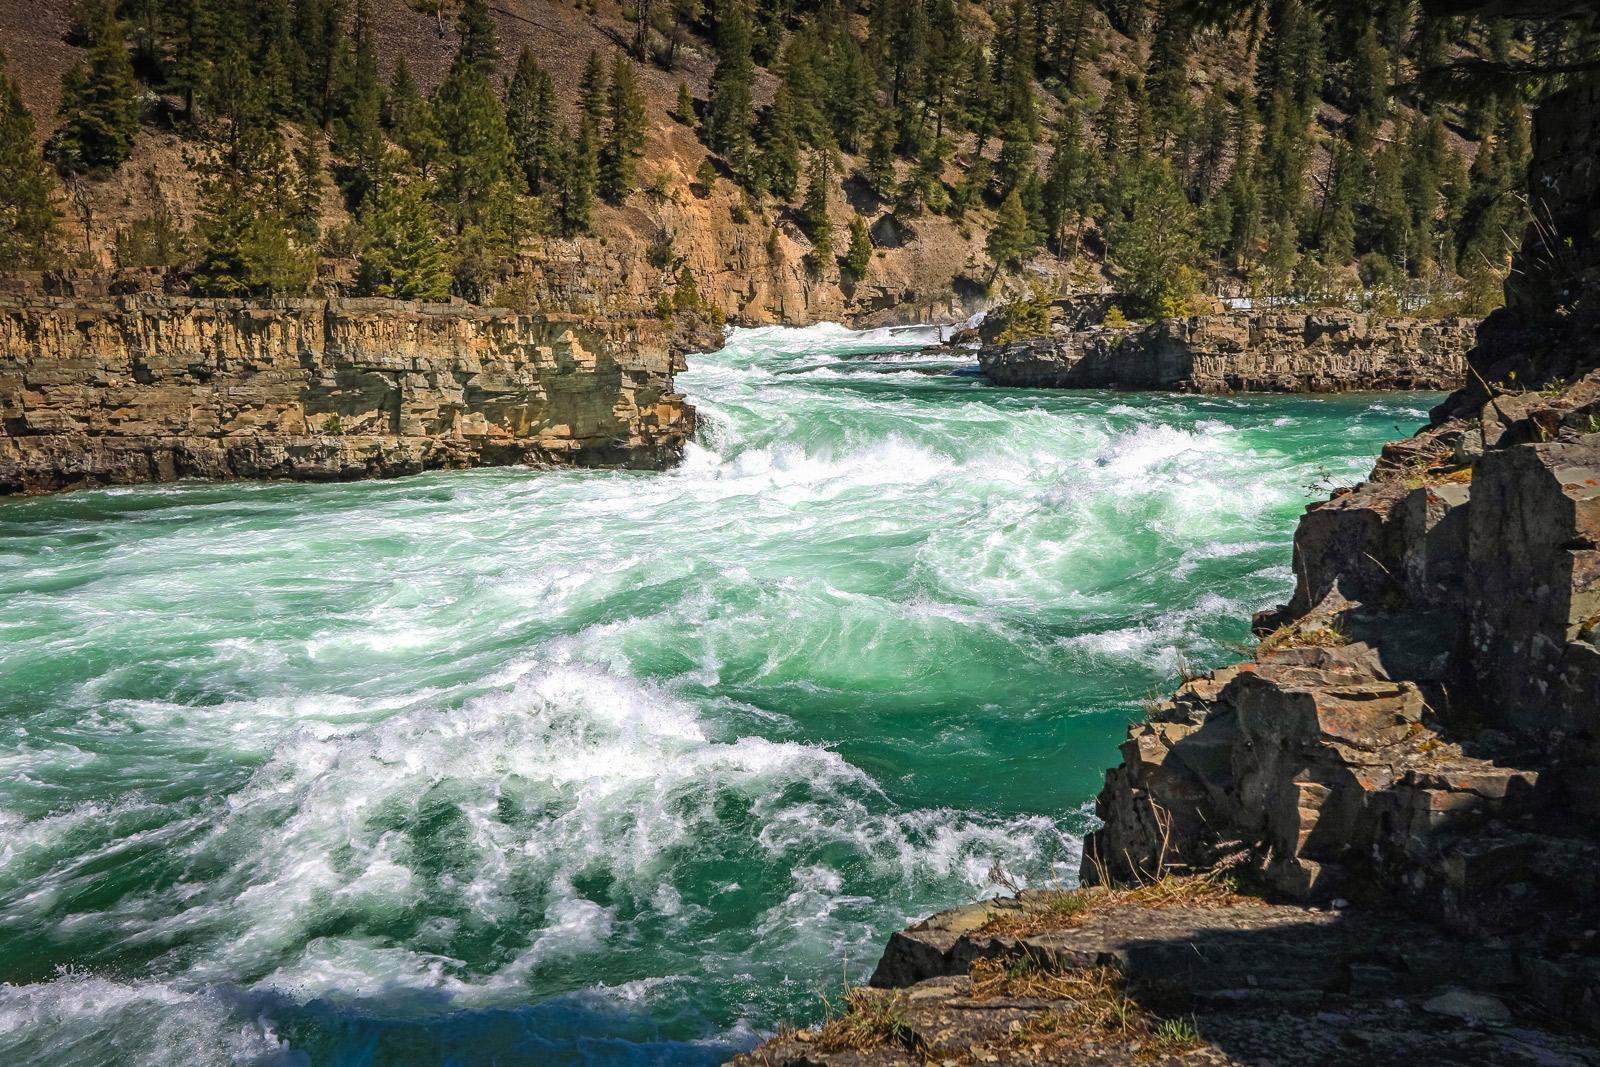 Kootenai Falls am Kootenai River